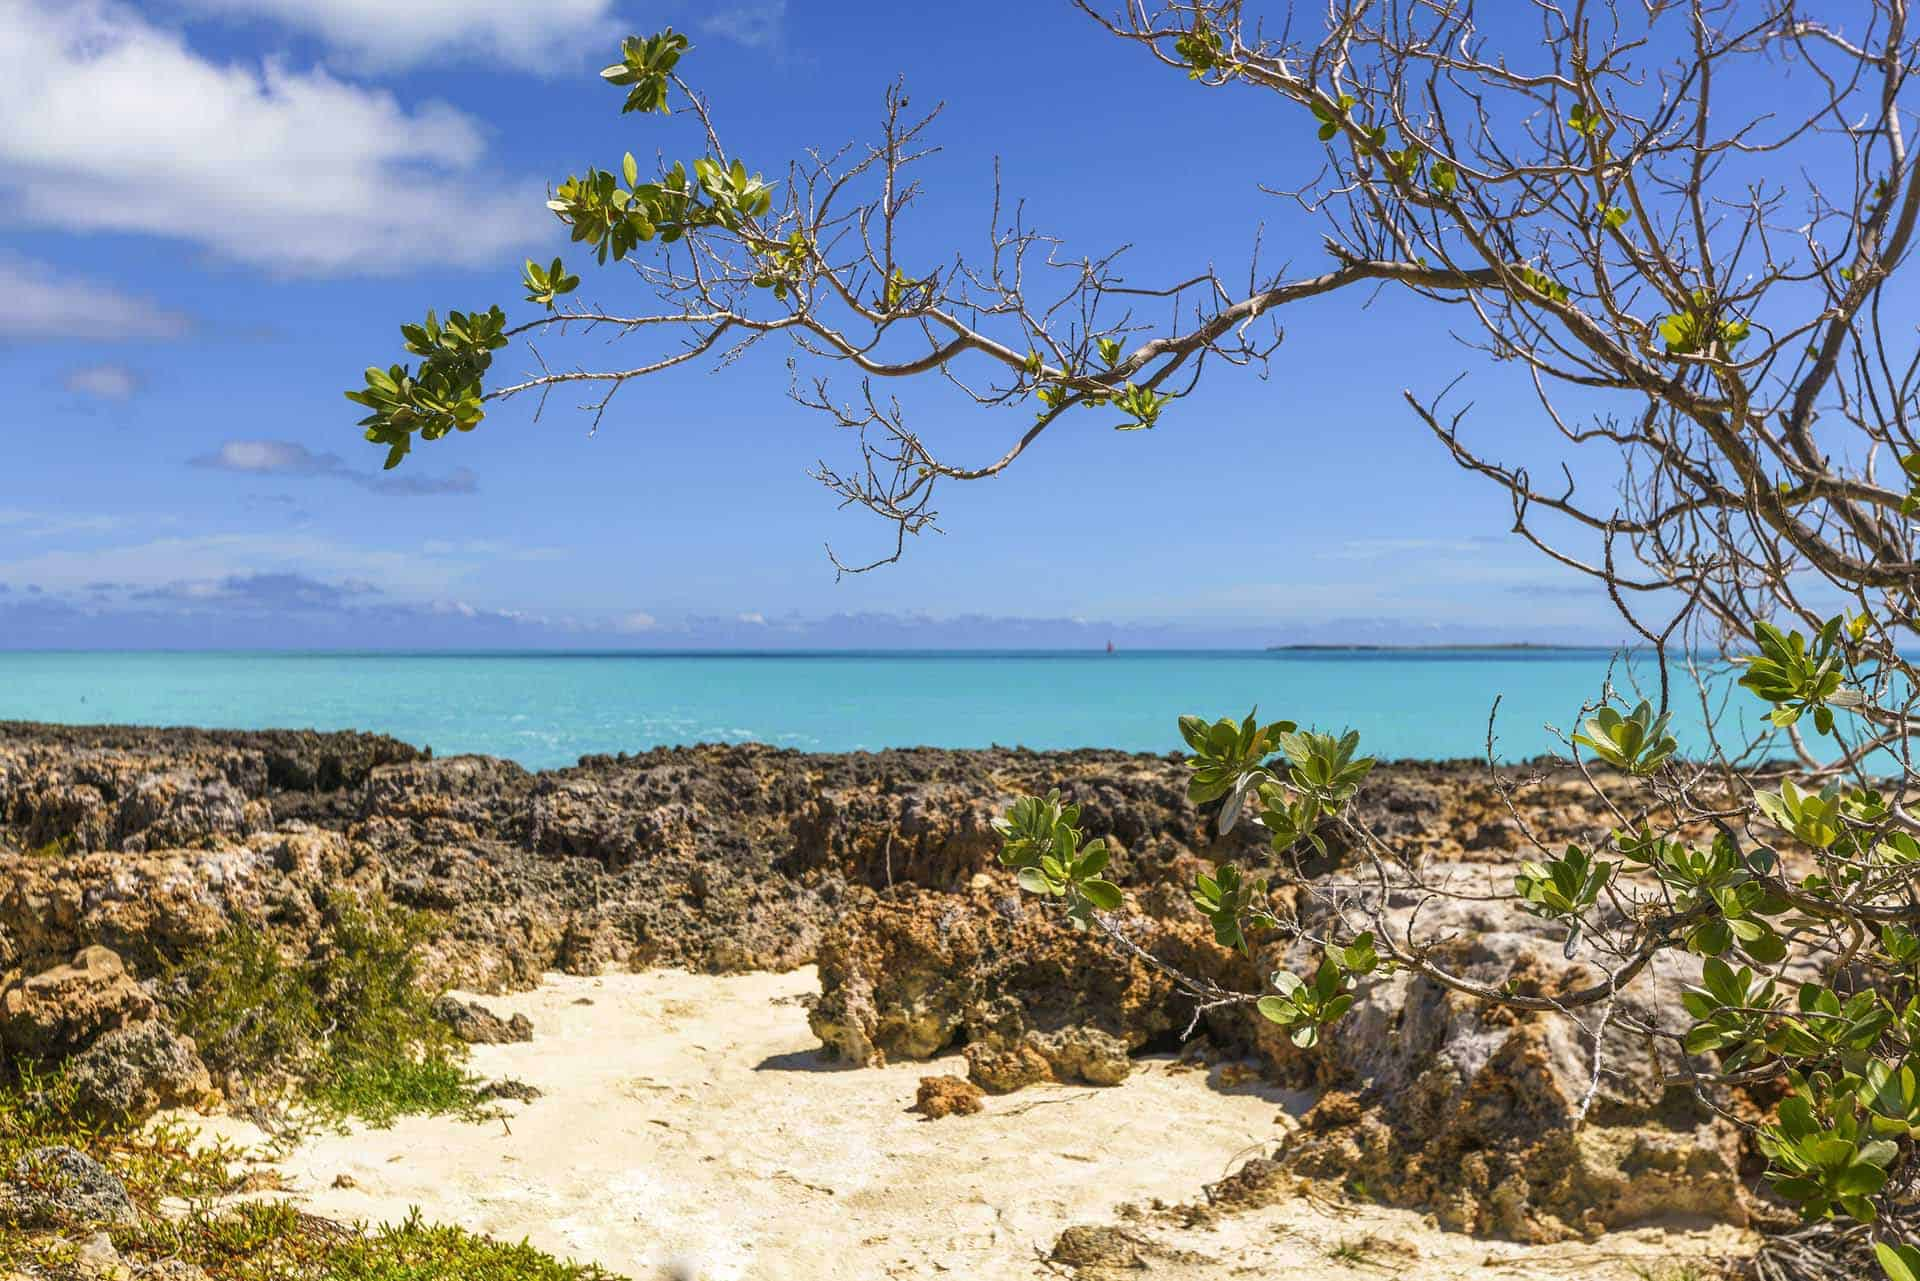 A0211 journee plage cayo santa maria 03 cuba autrement